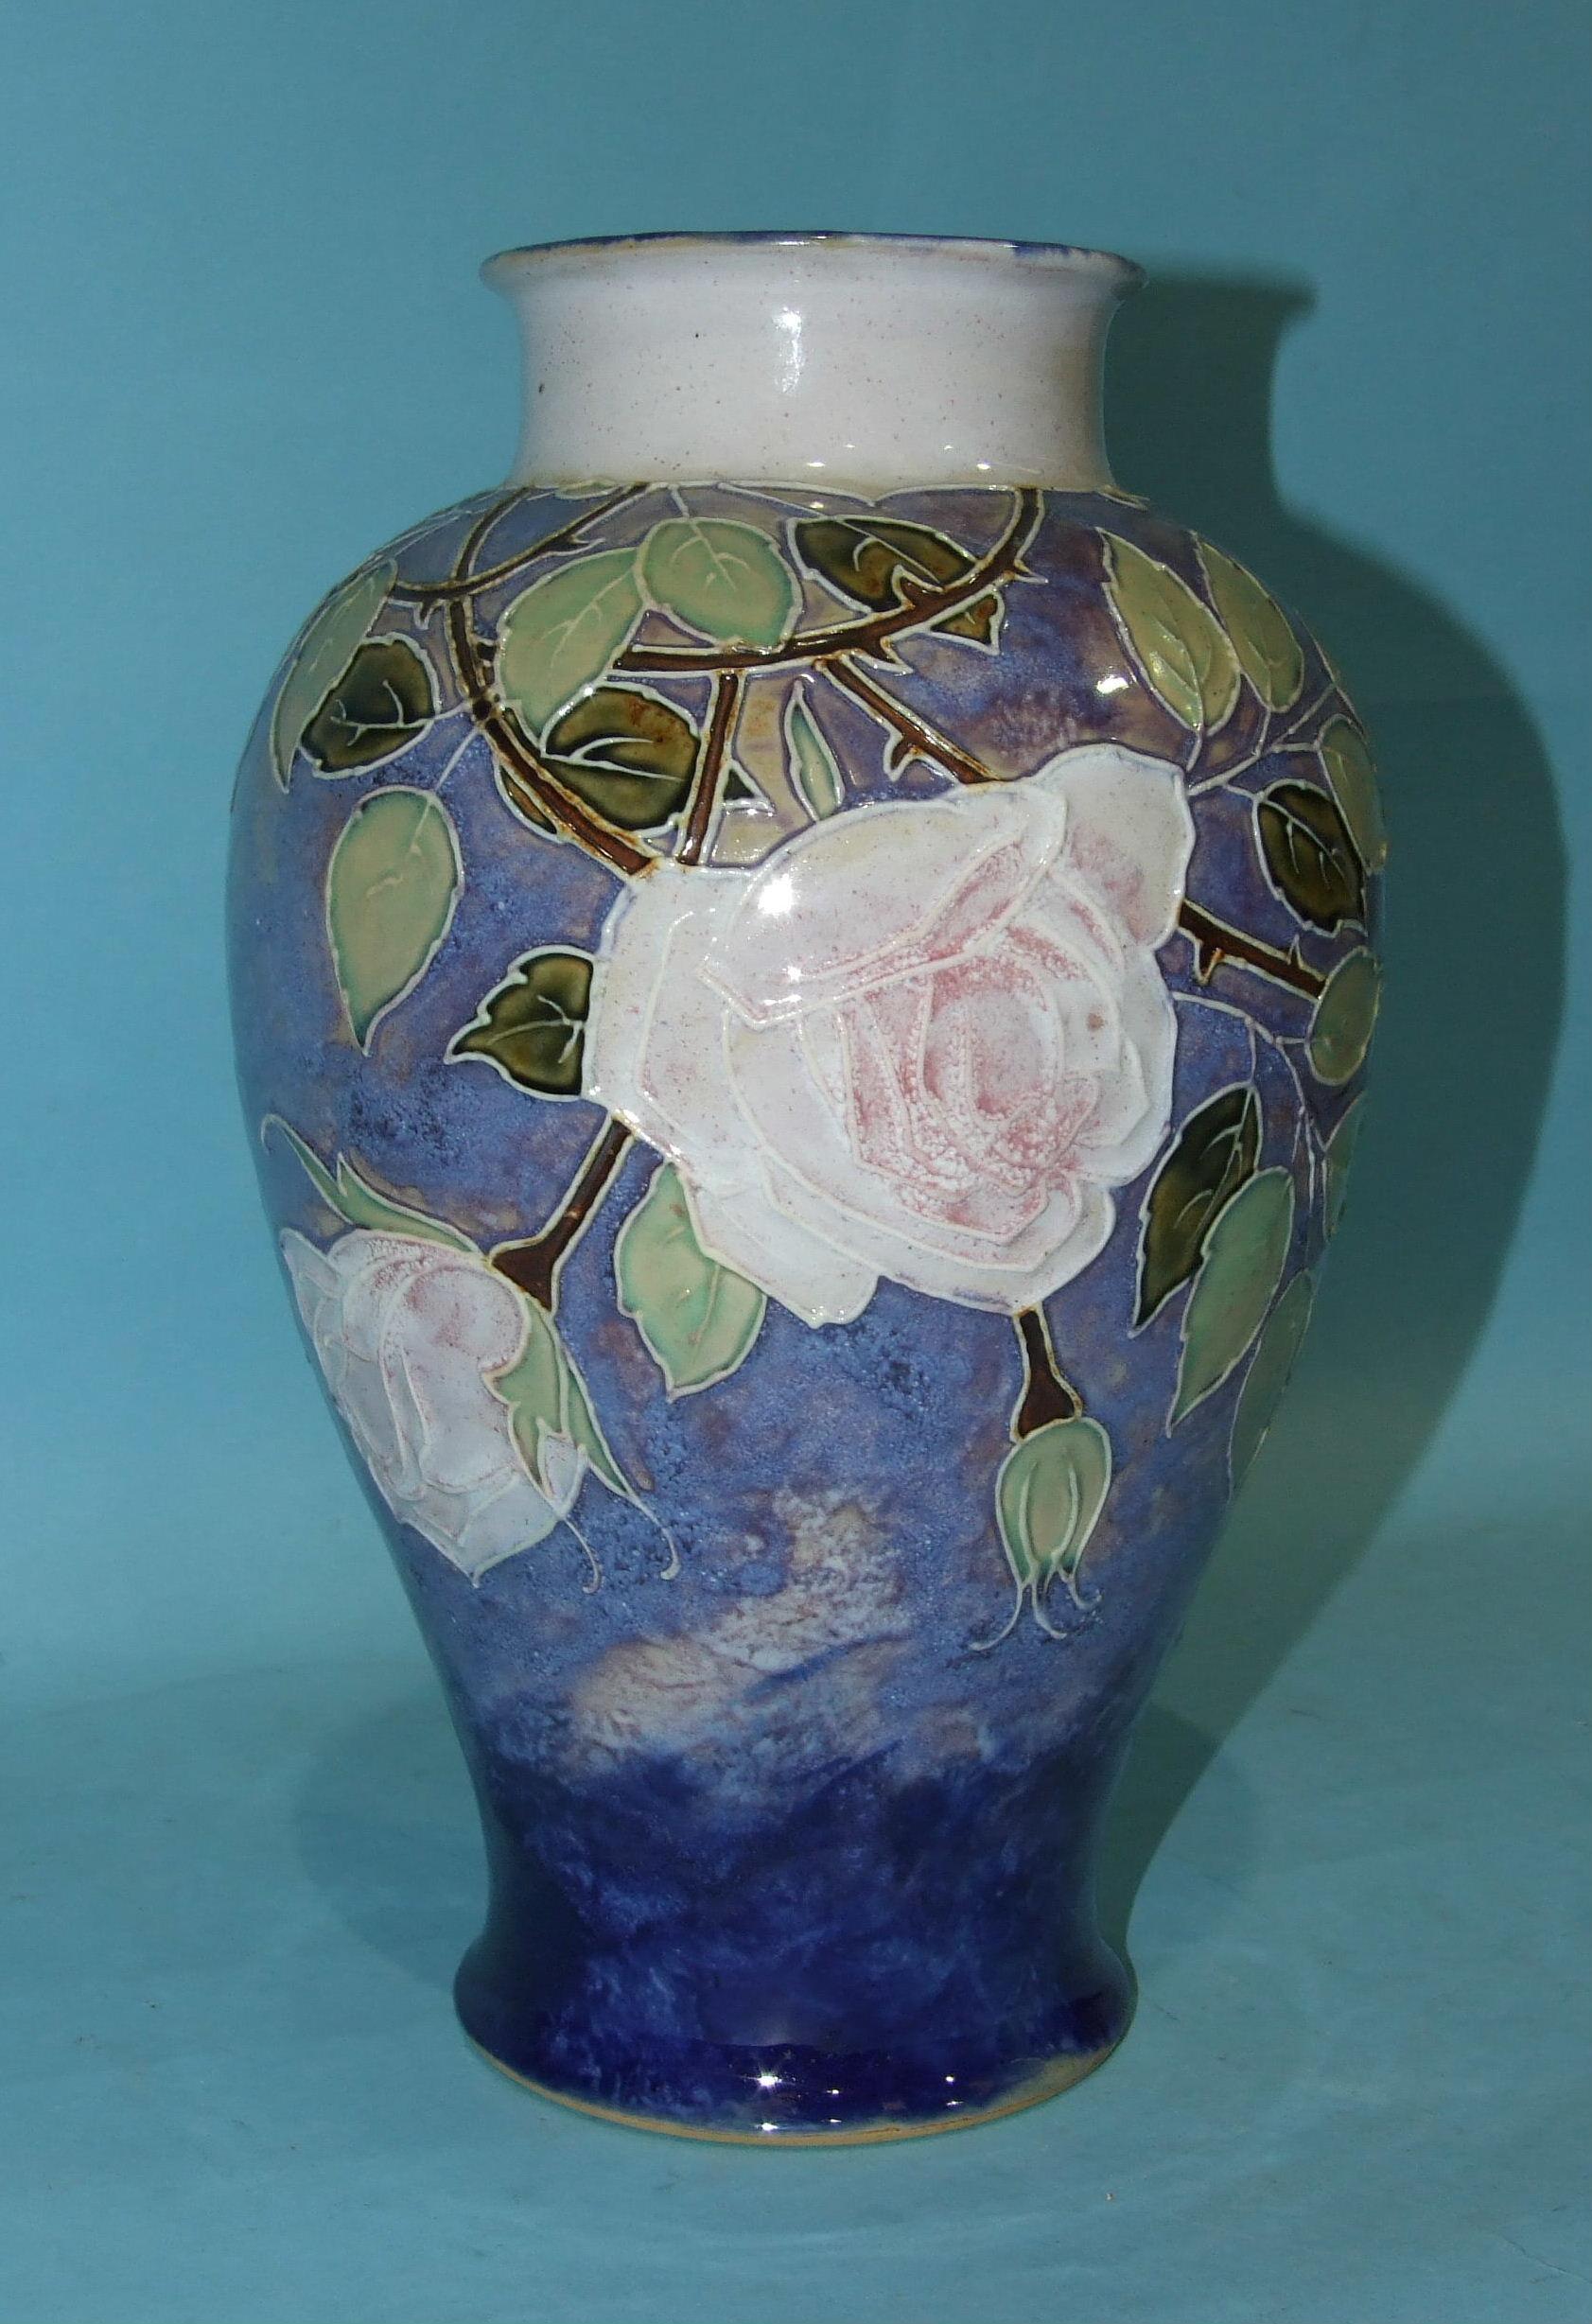 Lot 146 - A large Royal Doulton baluster stoneware vase with tubeline decoration of roses and foliate